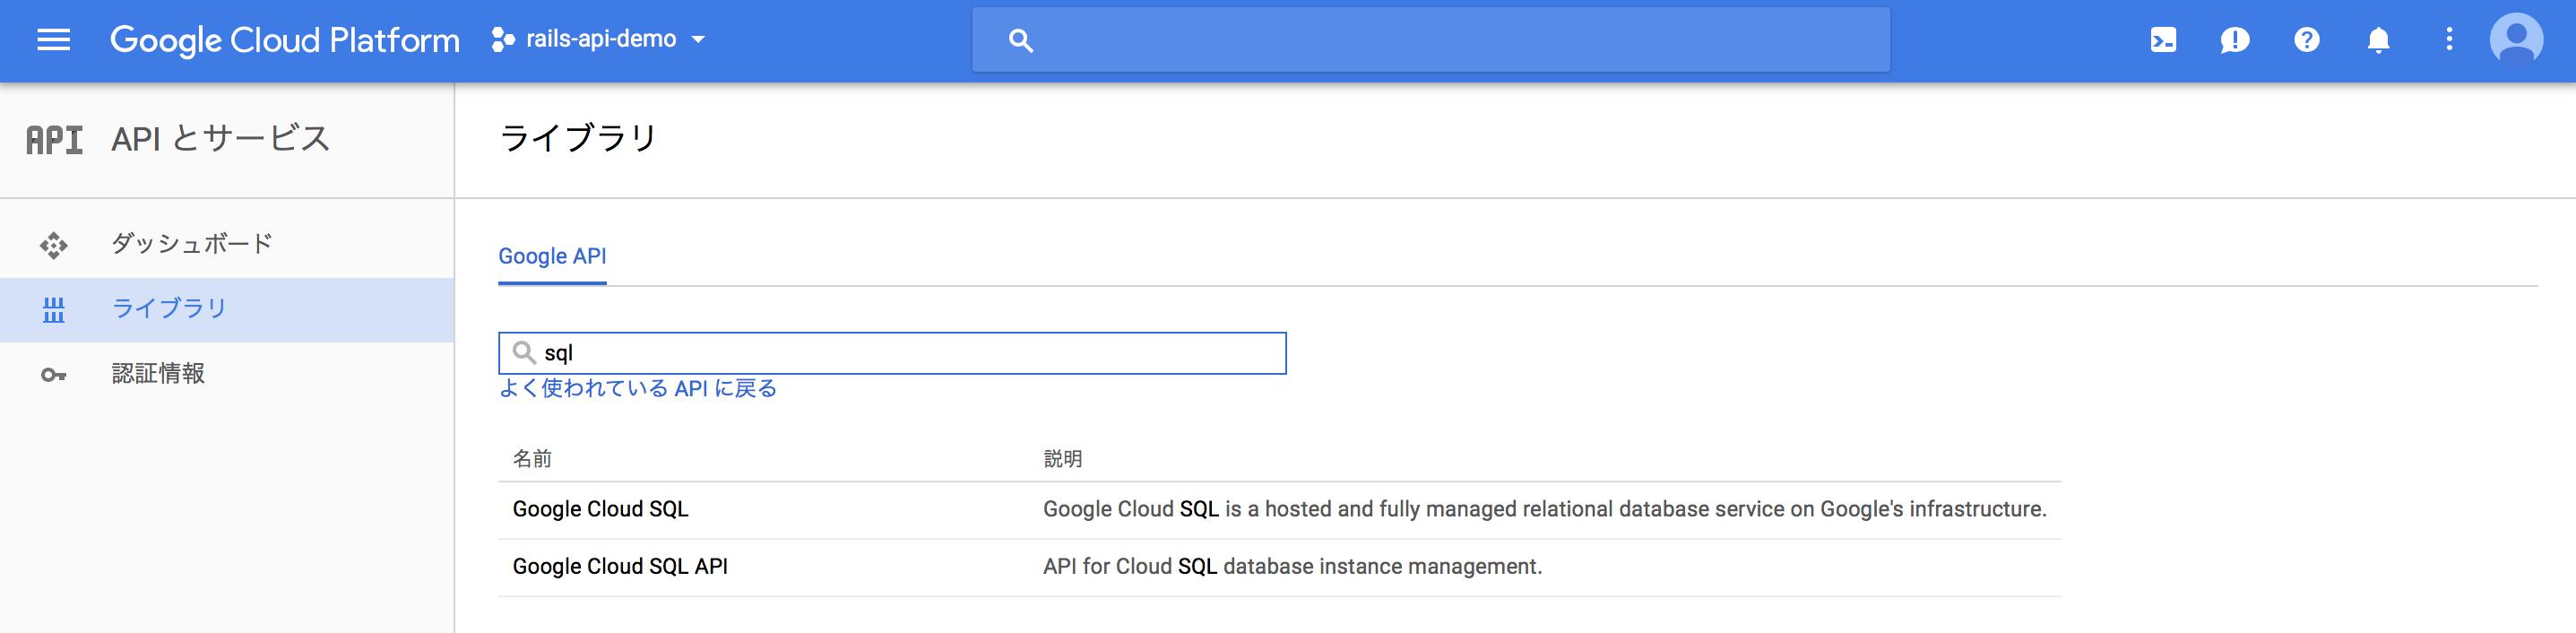 GoogleAppEngine+CloudSQL(MySQL)+Rails5環境を作成する - Qiita